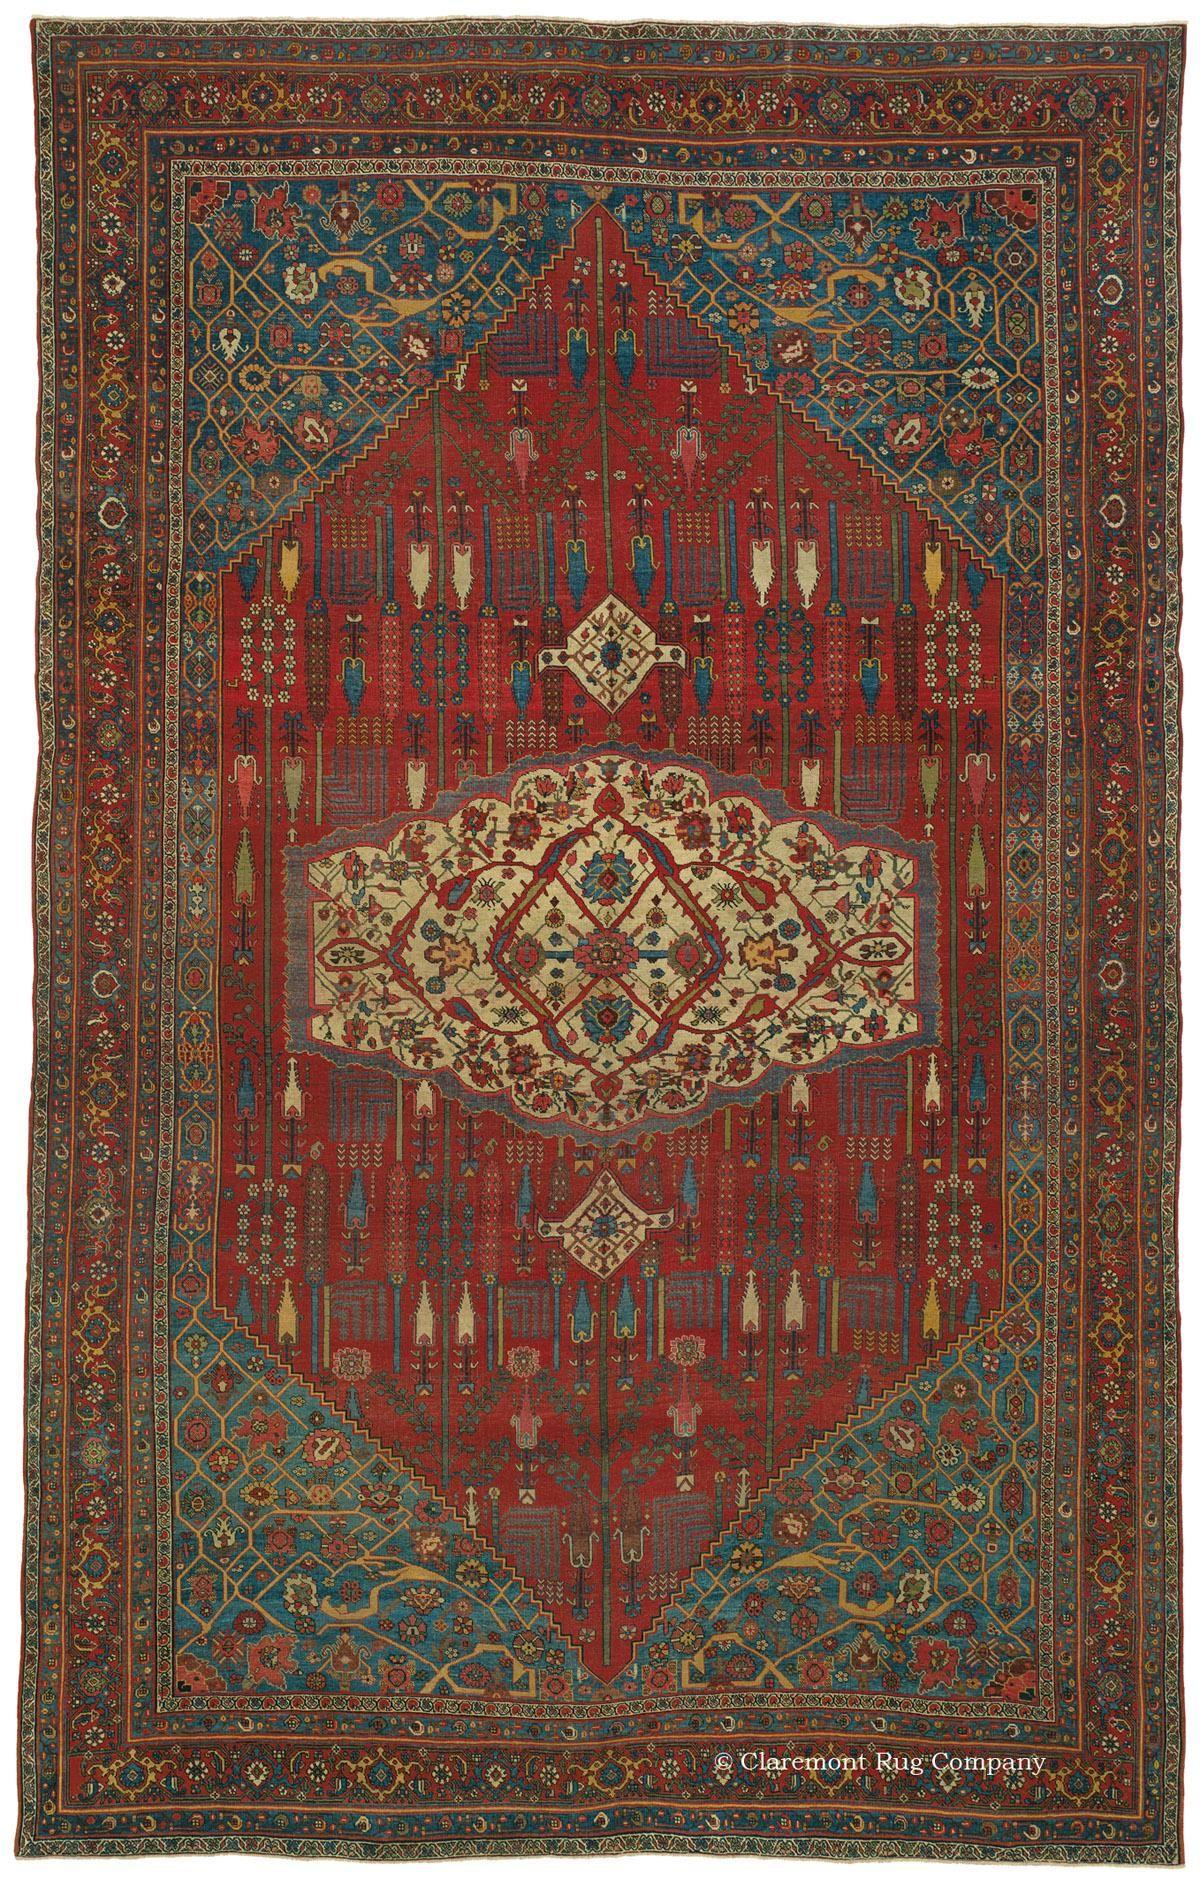 HALVAI BIJAR, Northwest Persian 9ft 4in x 14ft 11in Circa 1875 http://www.claremontrug.com/antique-oriental-rugs-carpets/antique-rugs-HALVAI+BIJAR%2c+Northwest+Persian-2736?